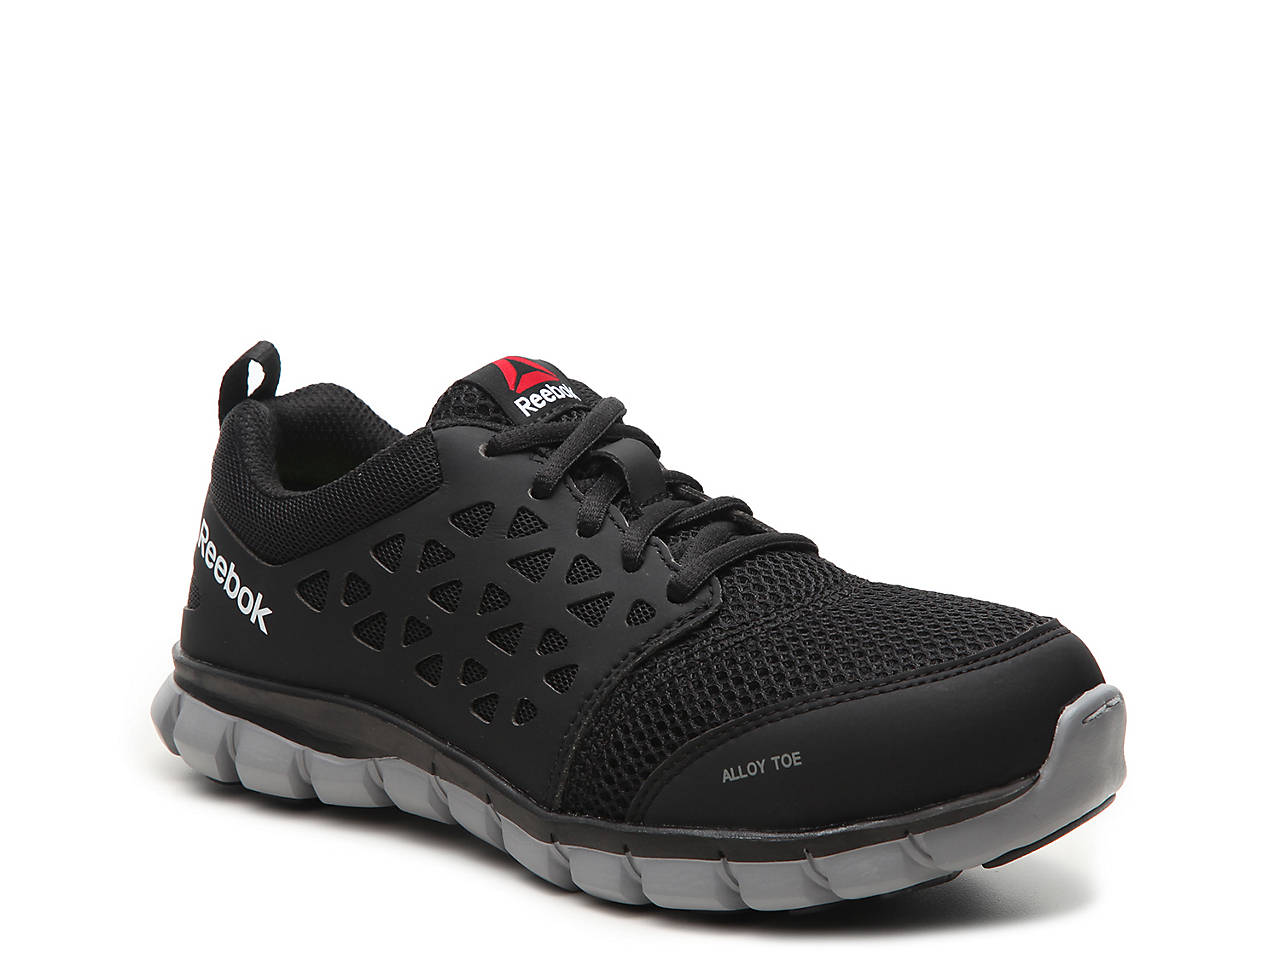 5c769d5270066b Reebok SubLite Cushion Alloy Toe Work Shoe Women s Shoes